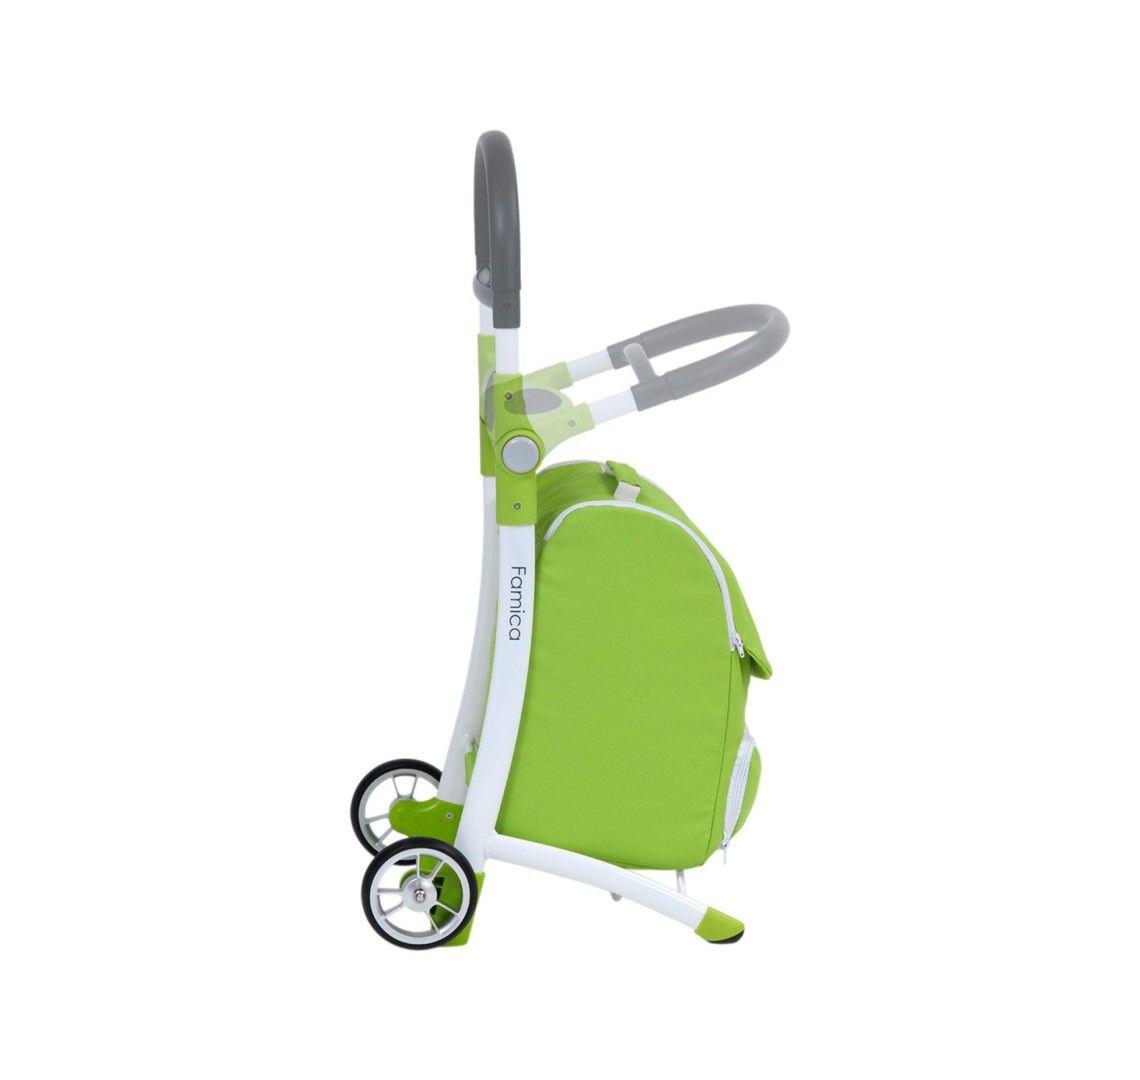 Shop N Sit Shopping Trolley seat